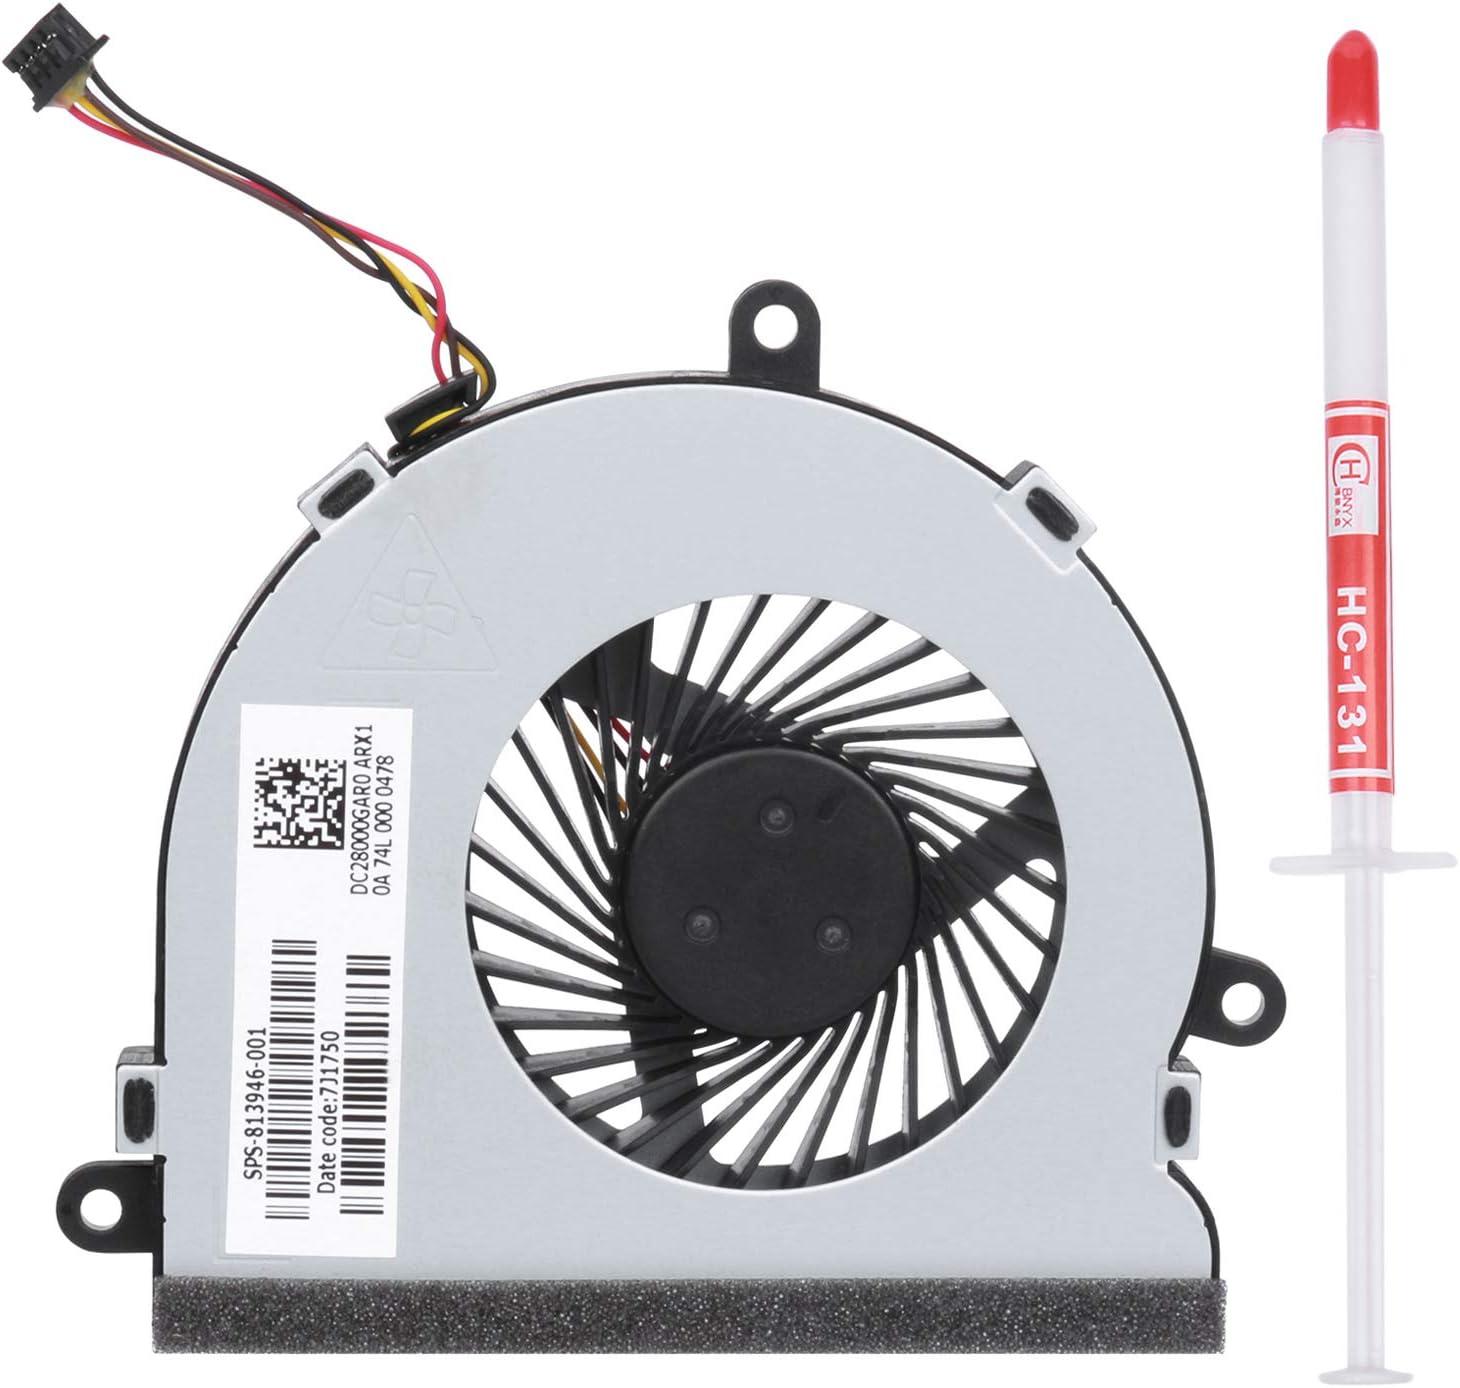 New CPU Cooling Cooler Fan for HP Pavilion 15-n280nr 15-n280us 15-n281nr 15-n283nr 15-n284ca 15-n284nr 15-n285nr 15-n286nr 15-n287cl 15-n287nr 15-n288ca 15-n288nr 15-n289nr